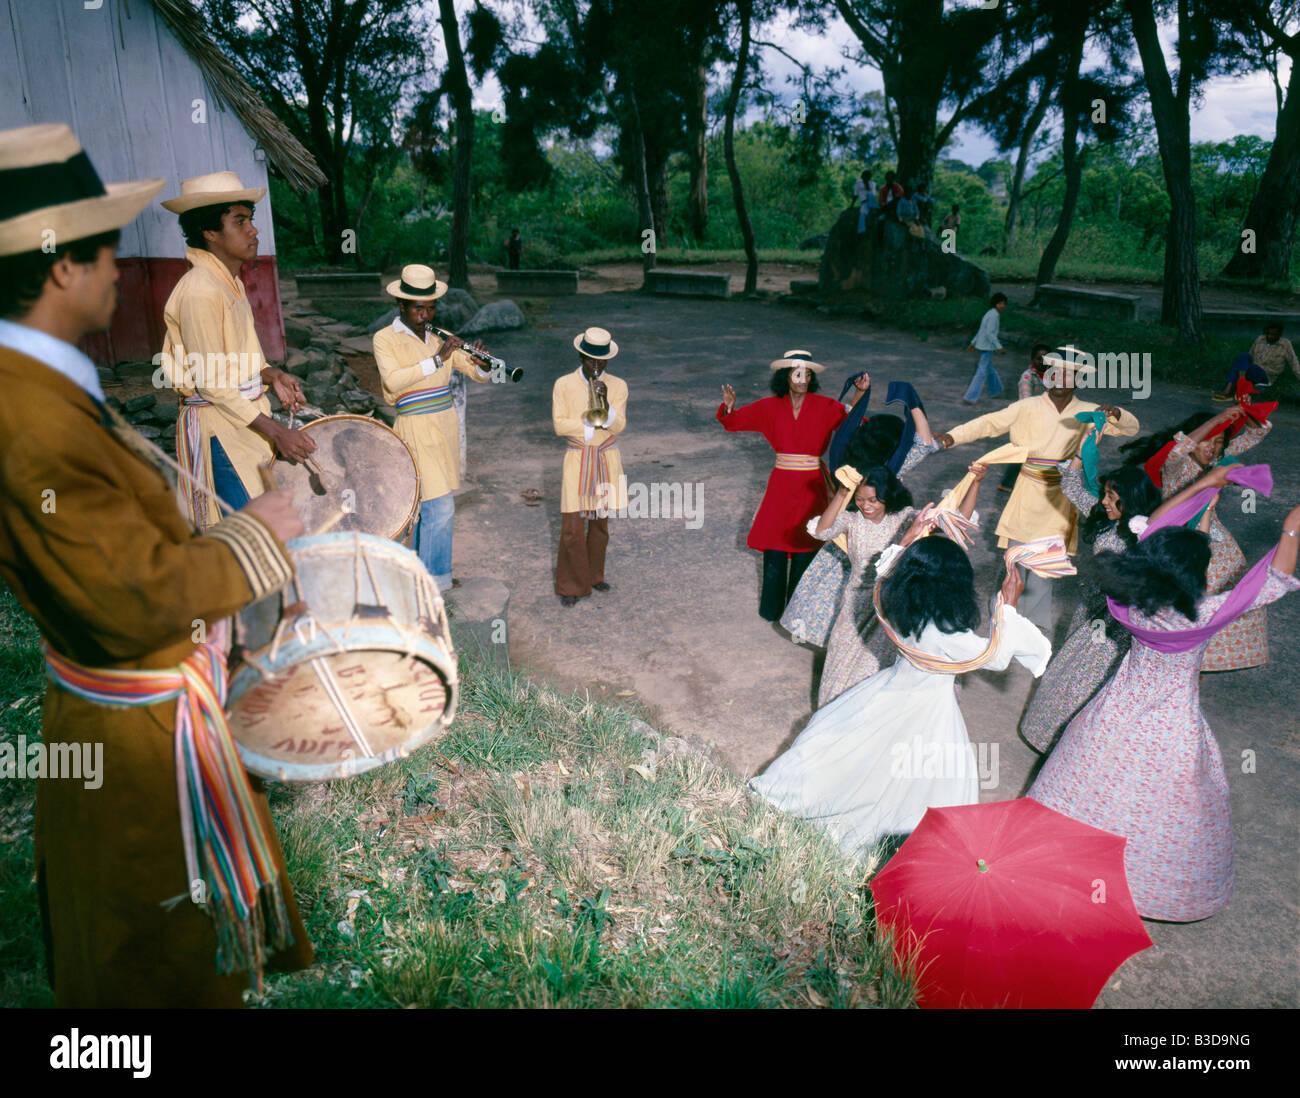 folklore madagascar Performance of traditional dance at Madagascar Madagascar Africa people Malagasy third world - Stock Image